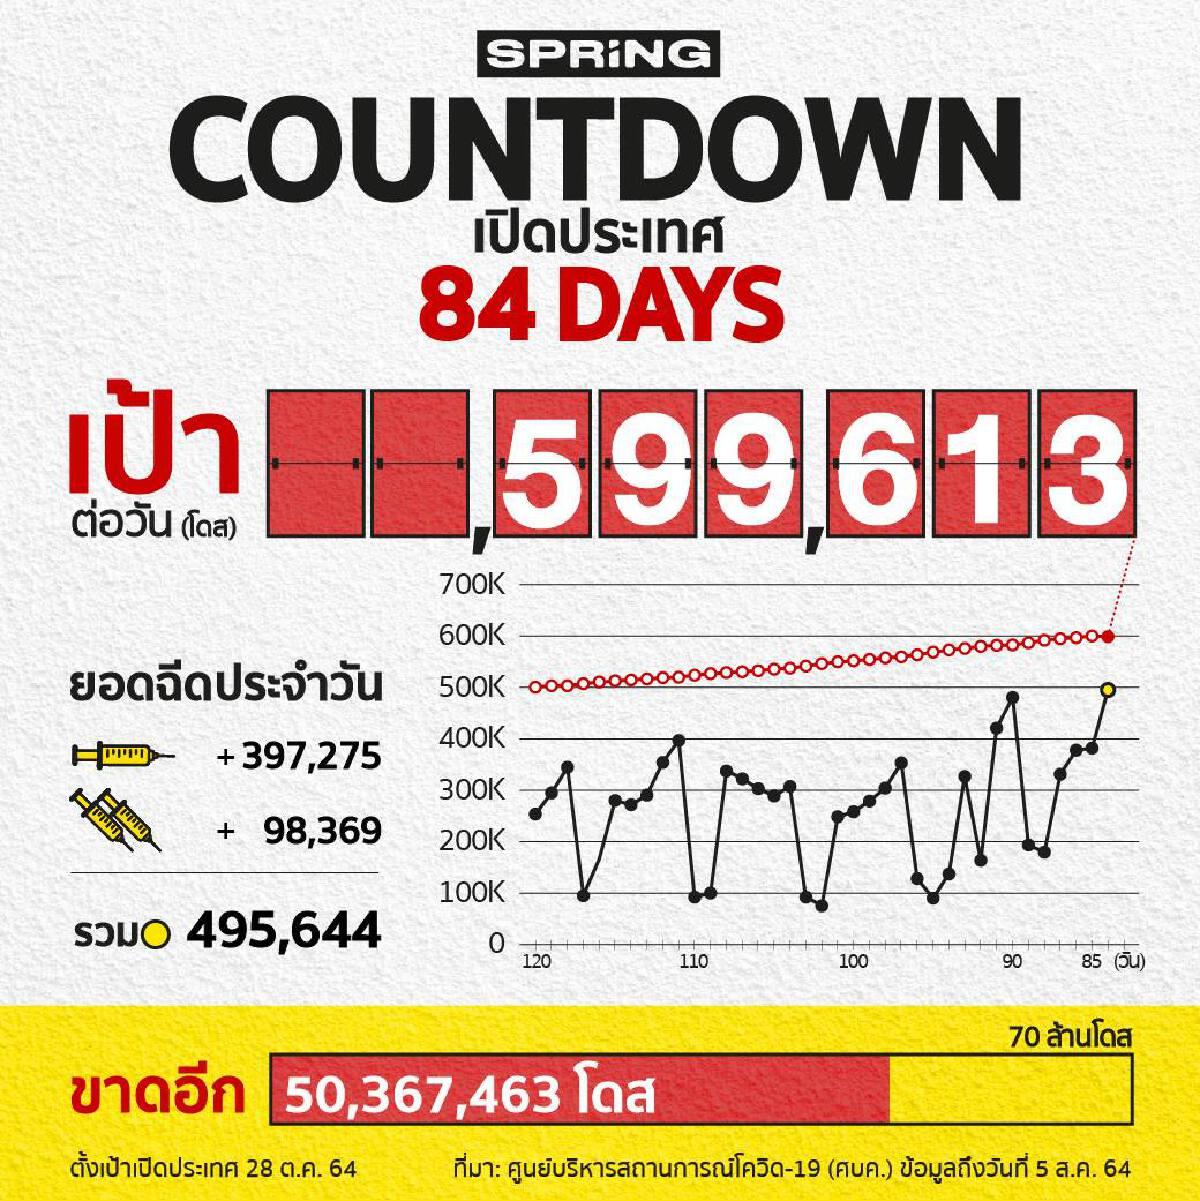 COUNTDOWN! เปิดประเทศใน 84 วัน ฉีดวัคซีนโควิด 495,644 โดส